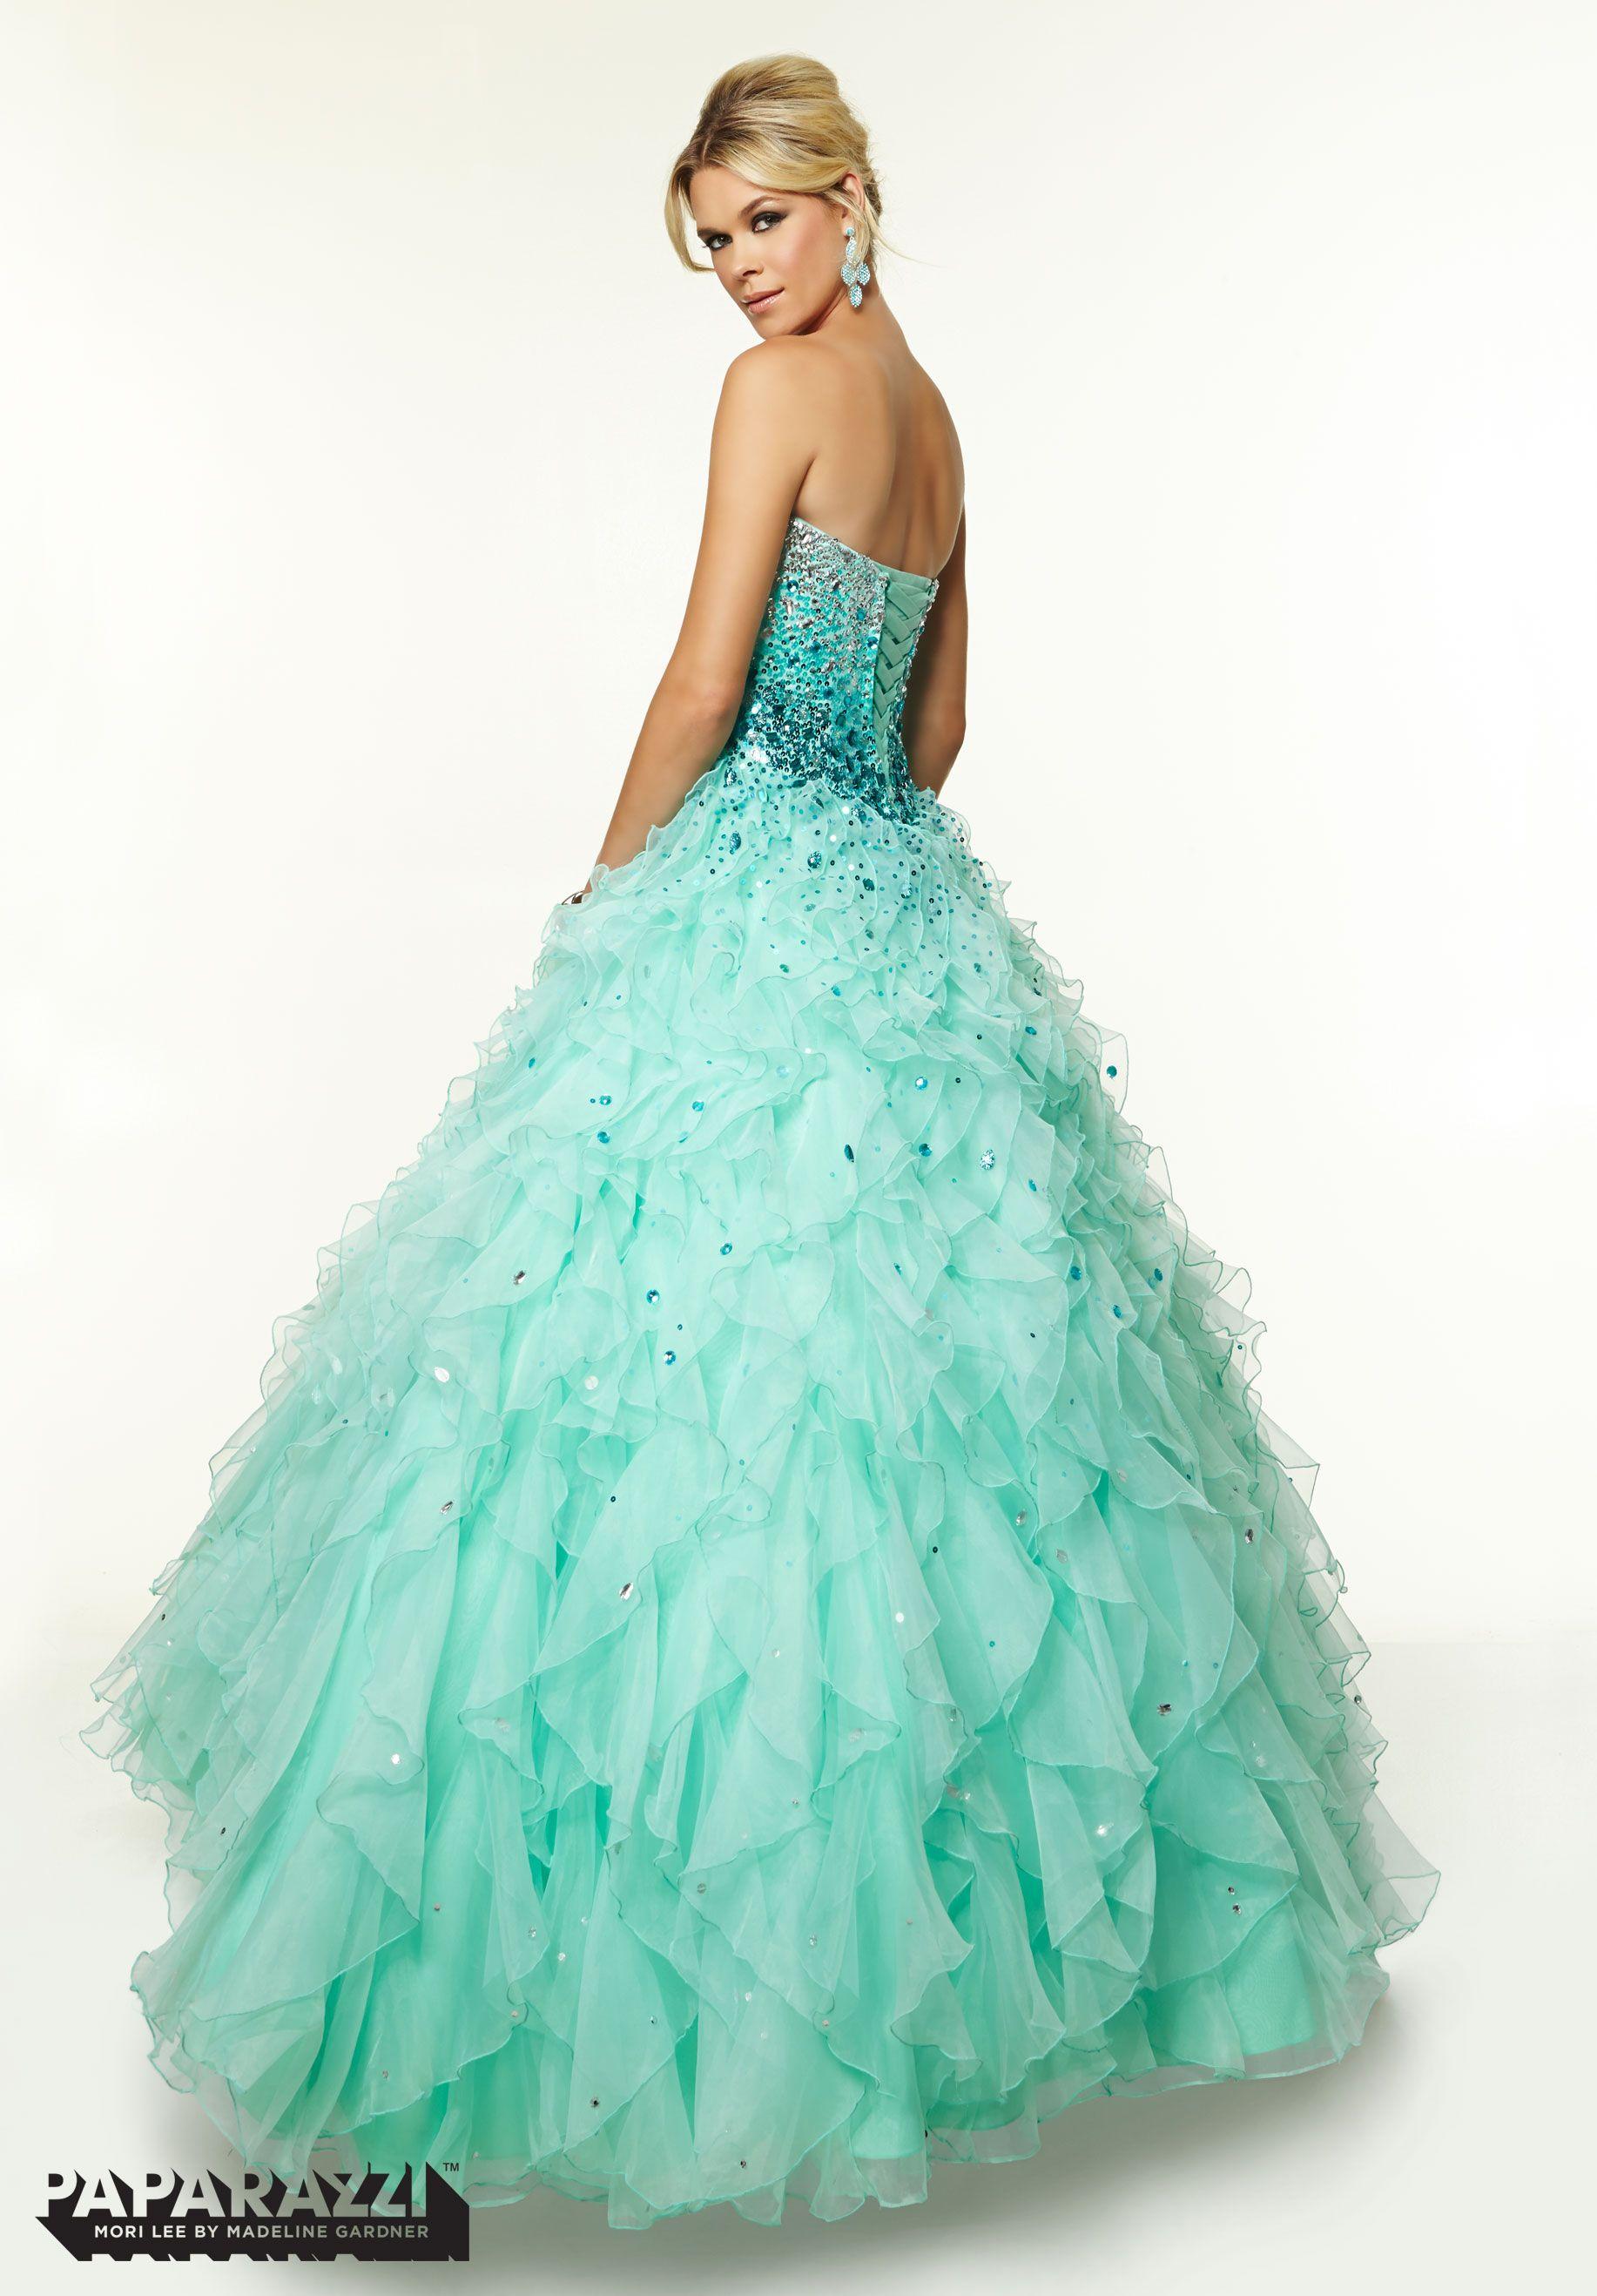 Prom Dresses – Paparazzi Prom Dress Style 97114 | PROM | Pinterest ...